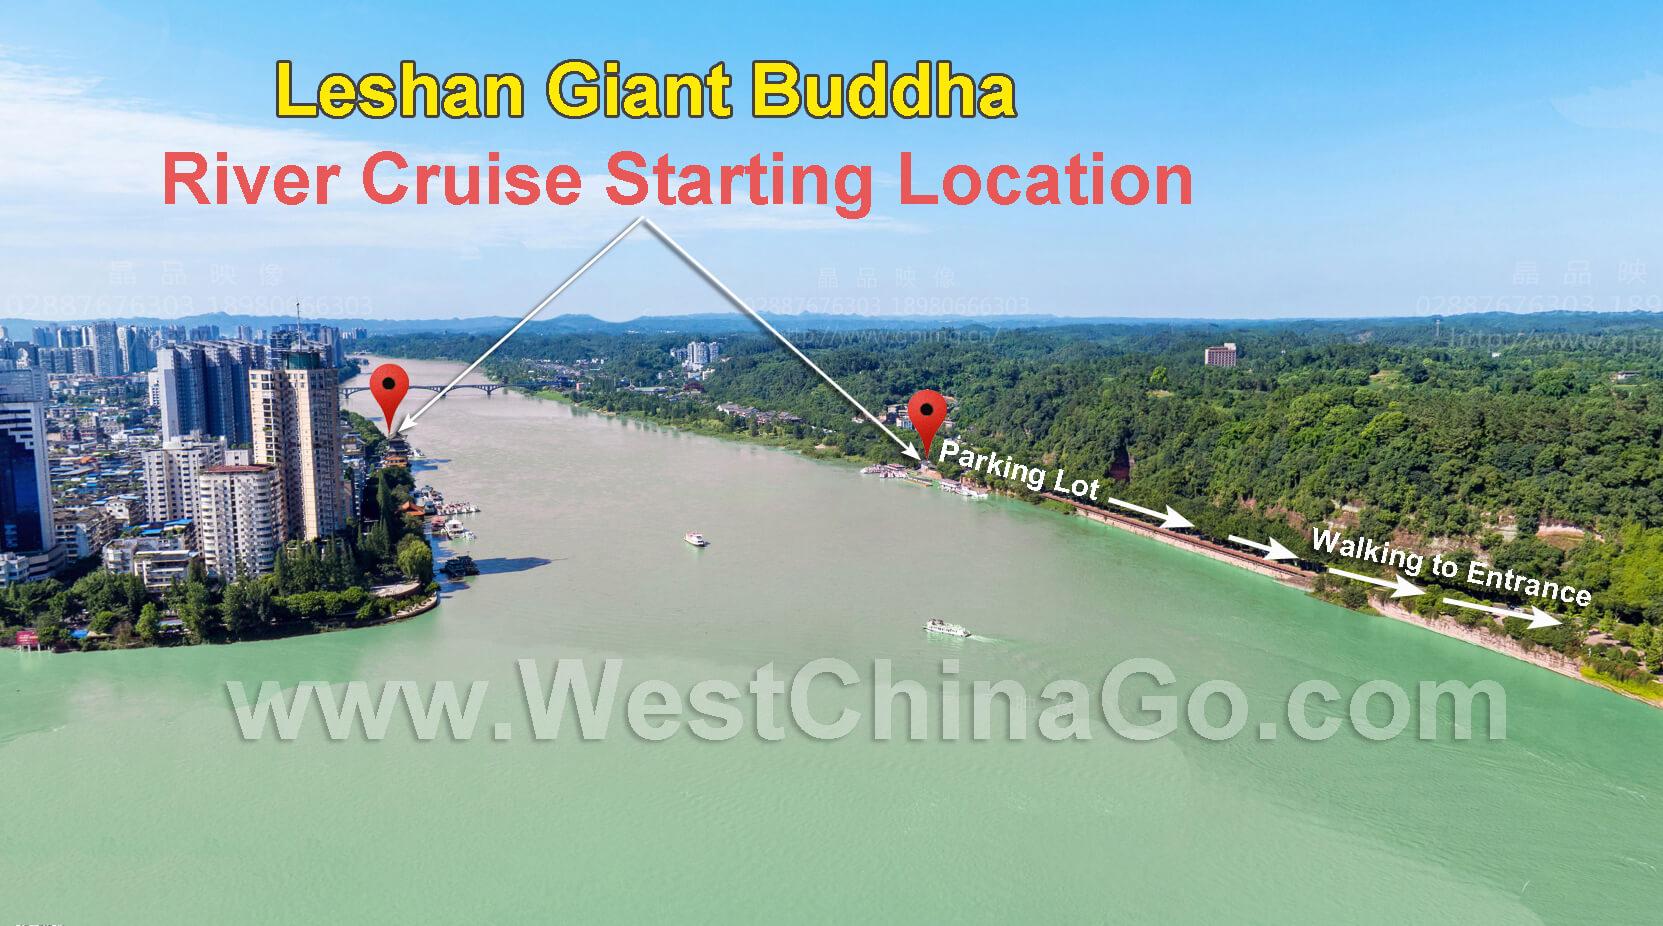 leshan giant buddha tour map